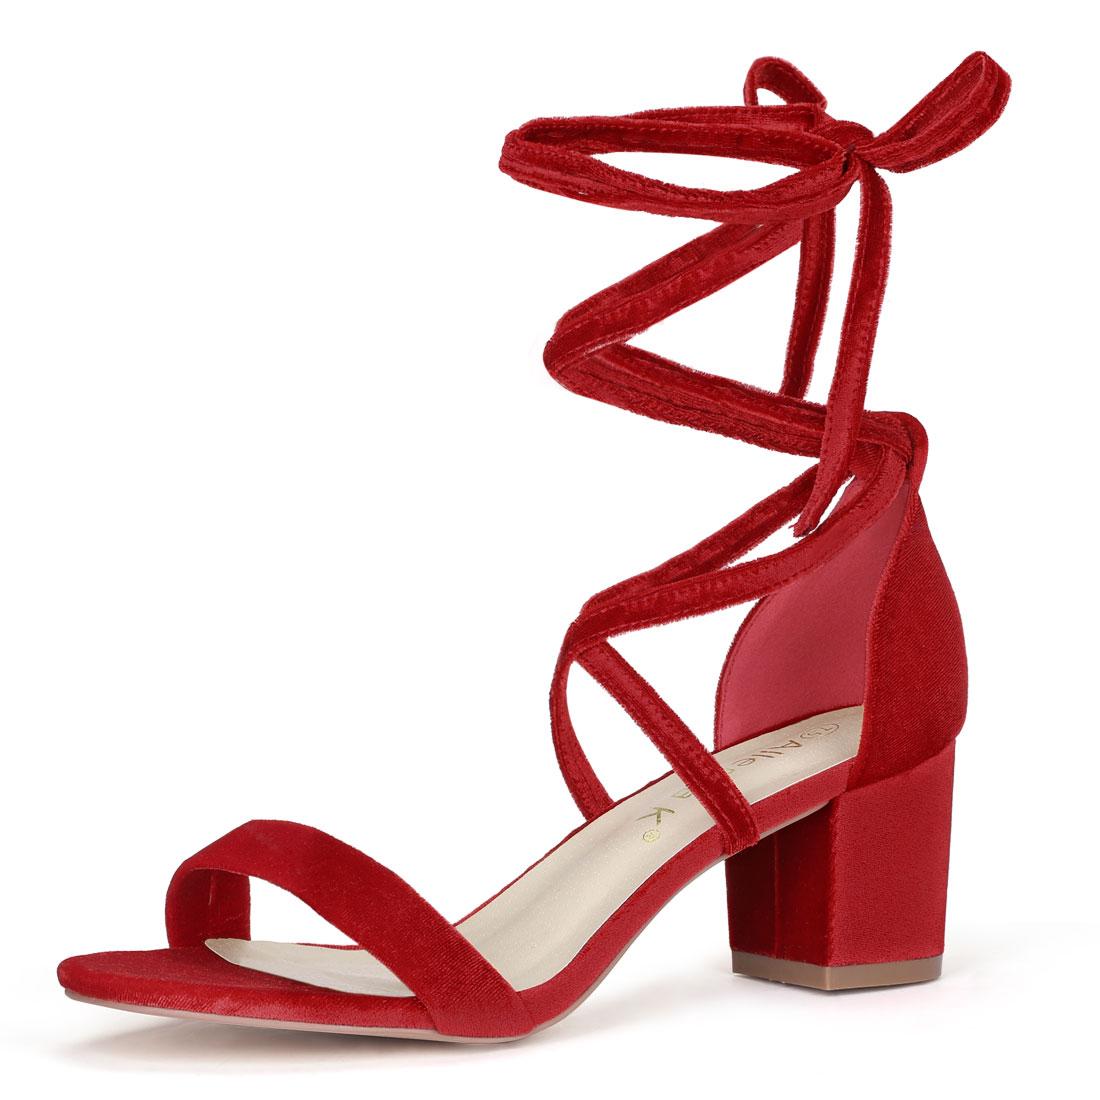 Allegra K Women Open Toe Lace Up Mid Chunky Heeled Sandals Red-velvet 8.5 M US